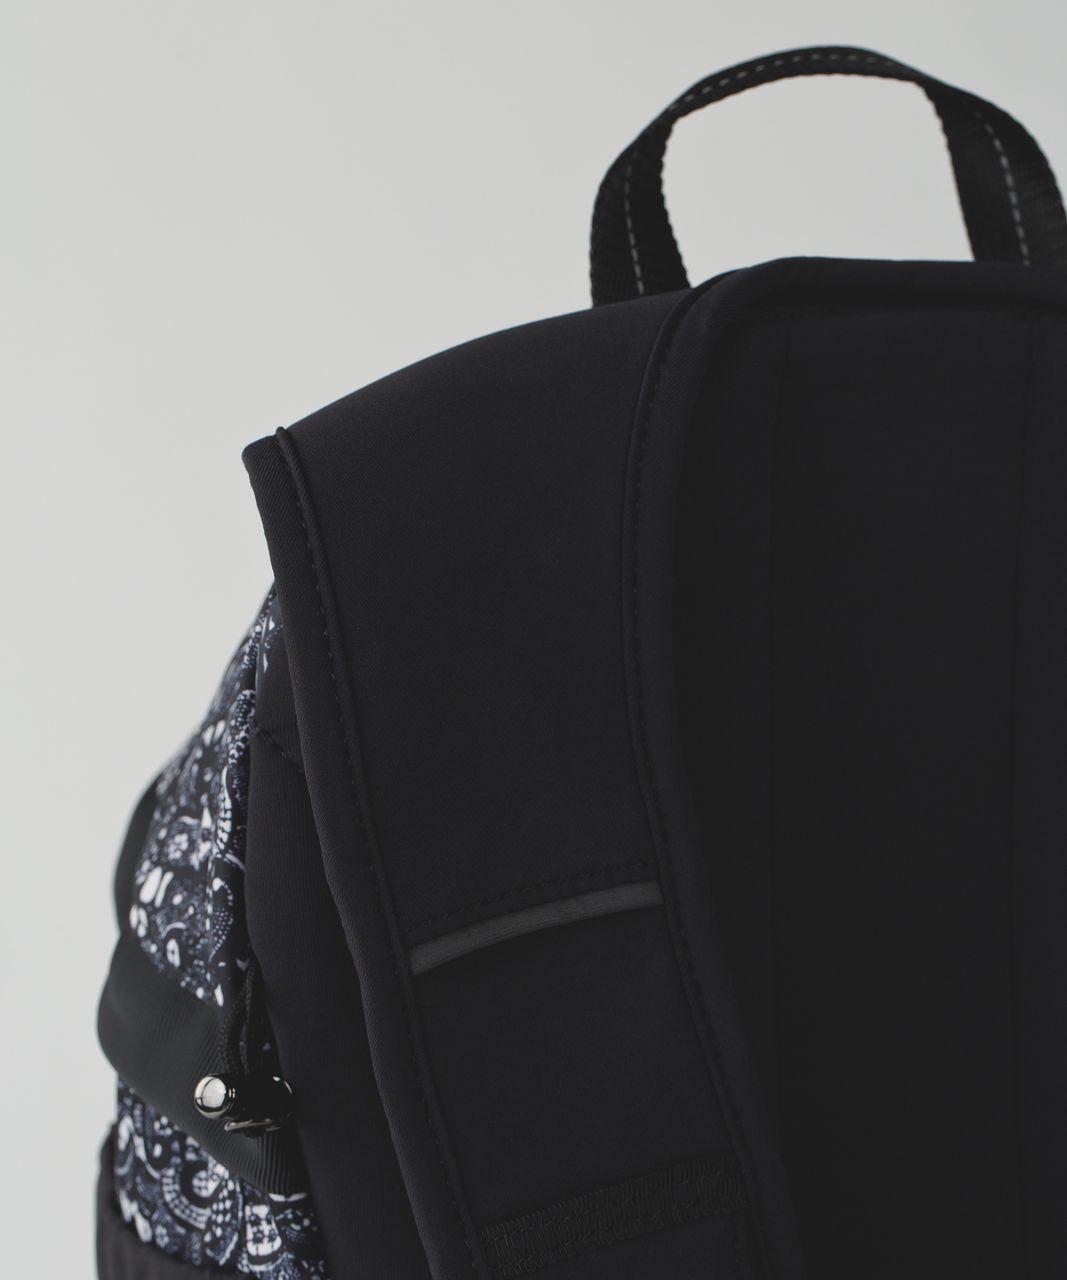 Lululemon Run All Day Backpack - Pretty Lace White Black / Black